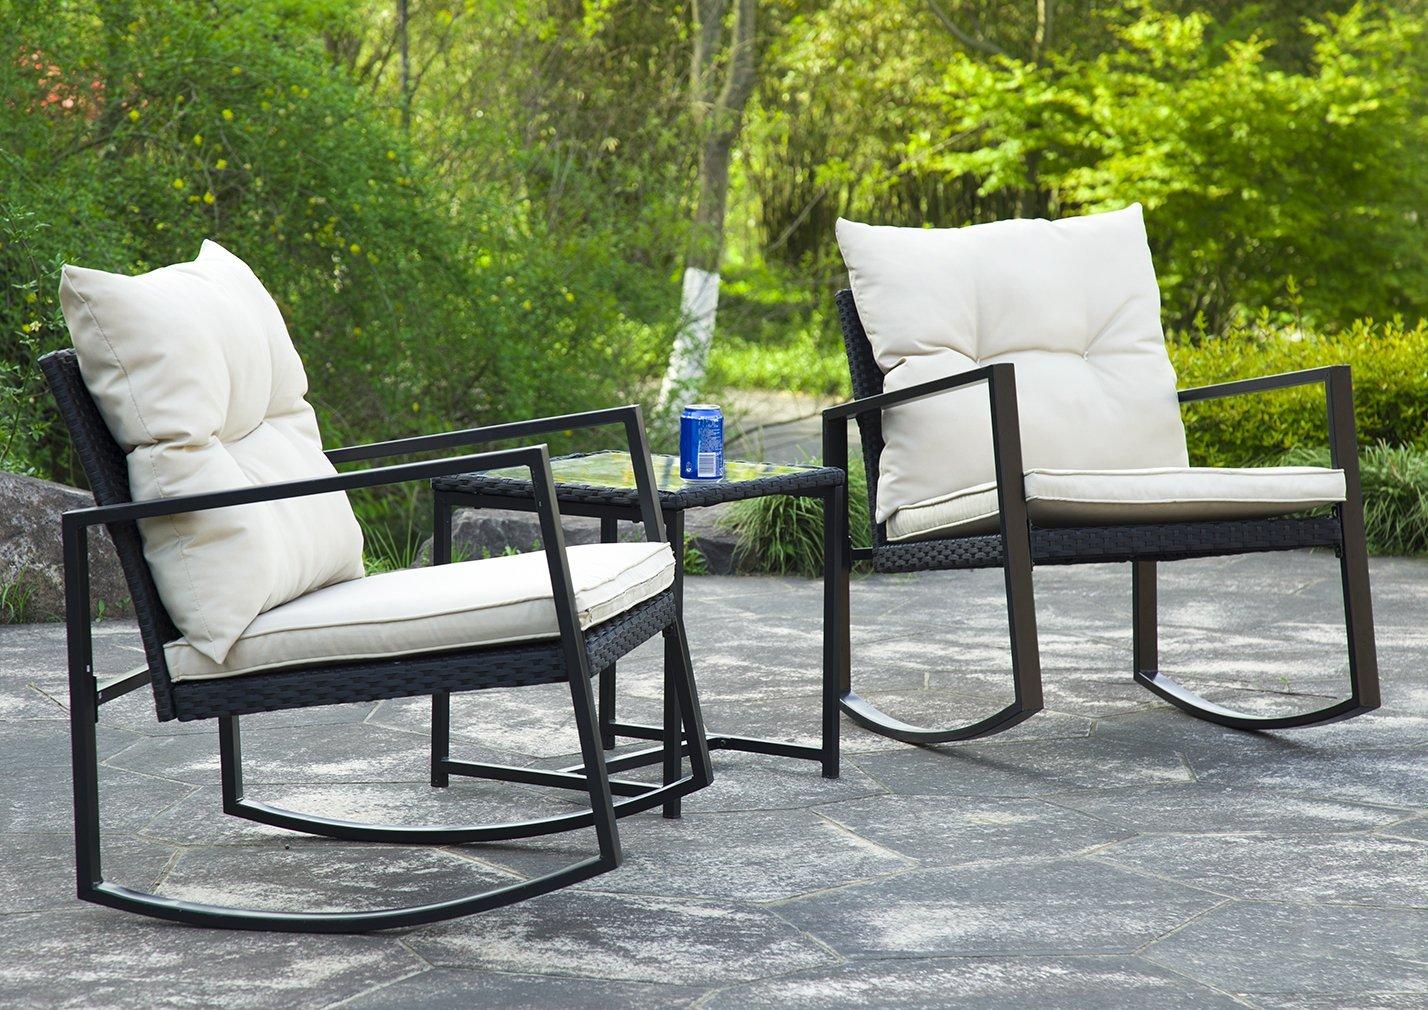 Outdoor 3PC Rattan Patio Furniture Sets Rocking Wicker Bistro Set For Yard BestMassage